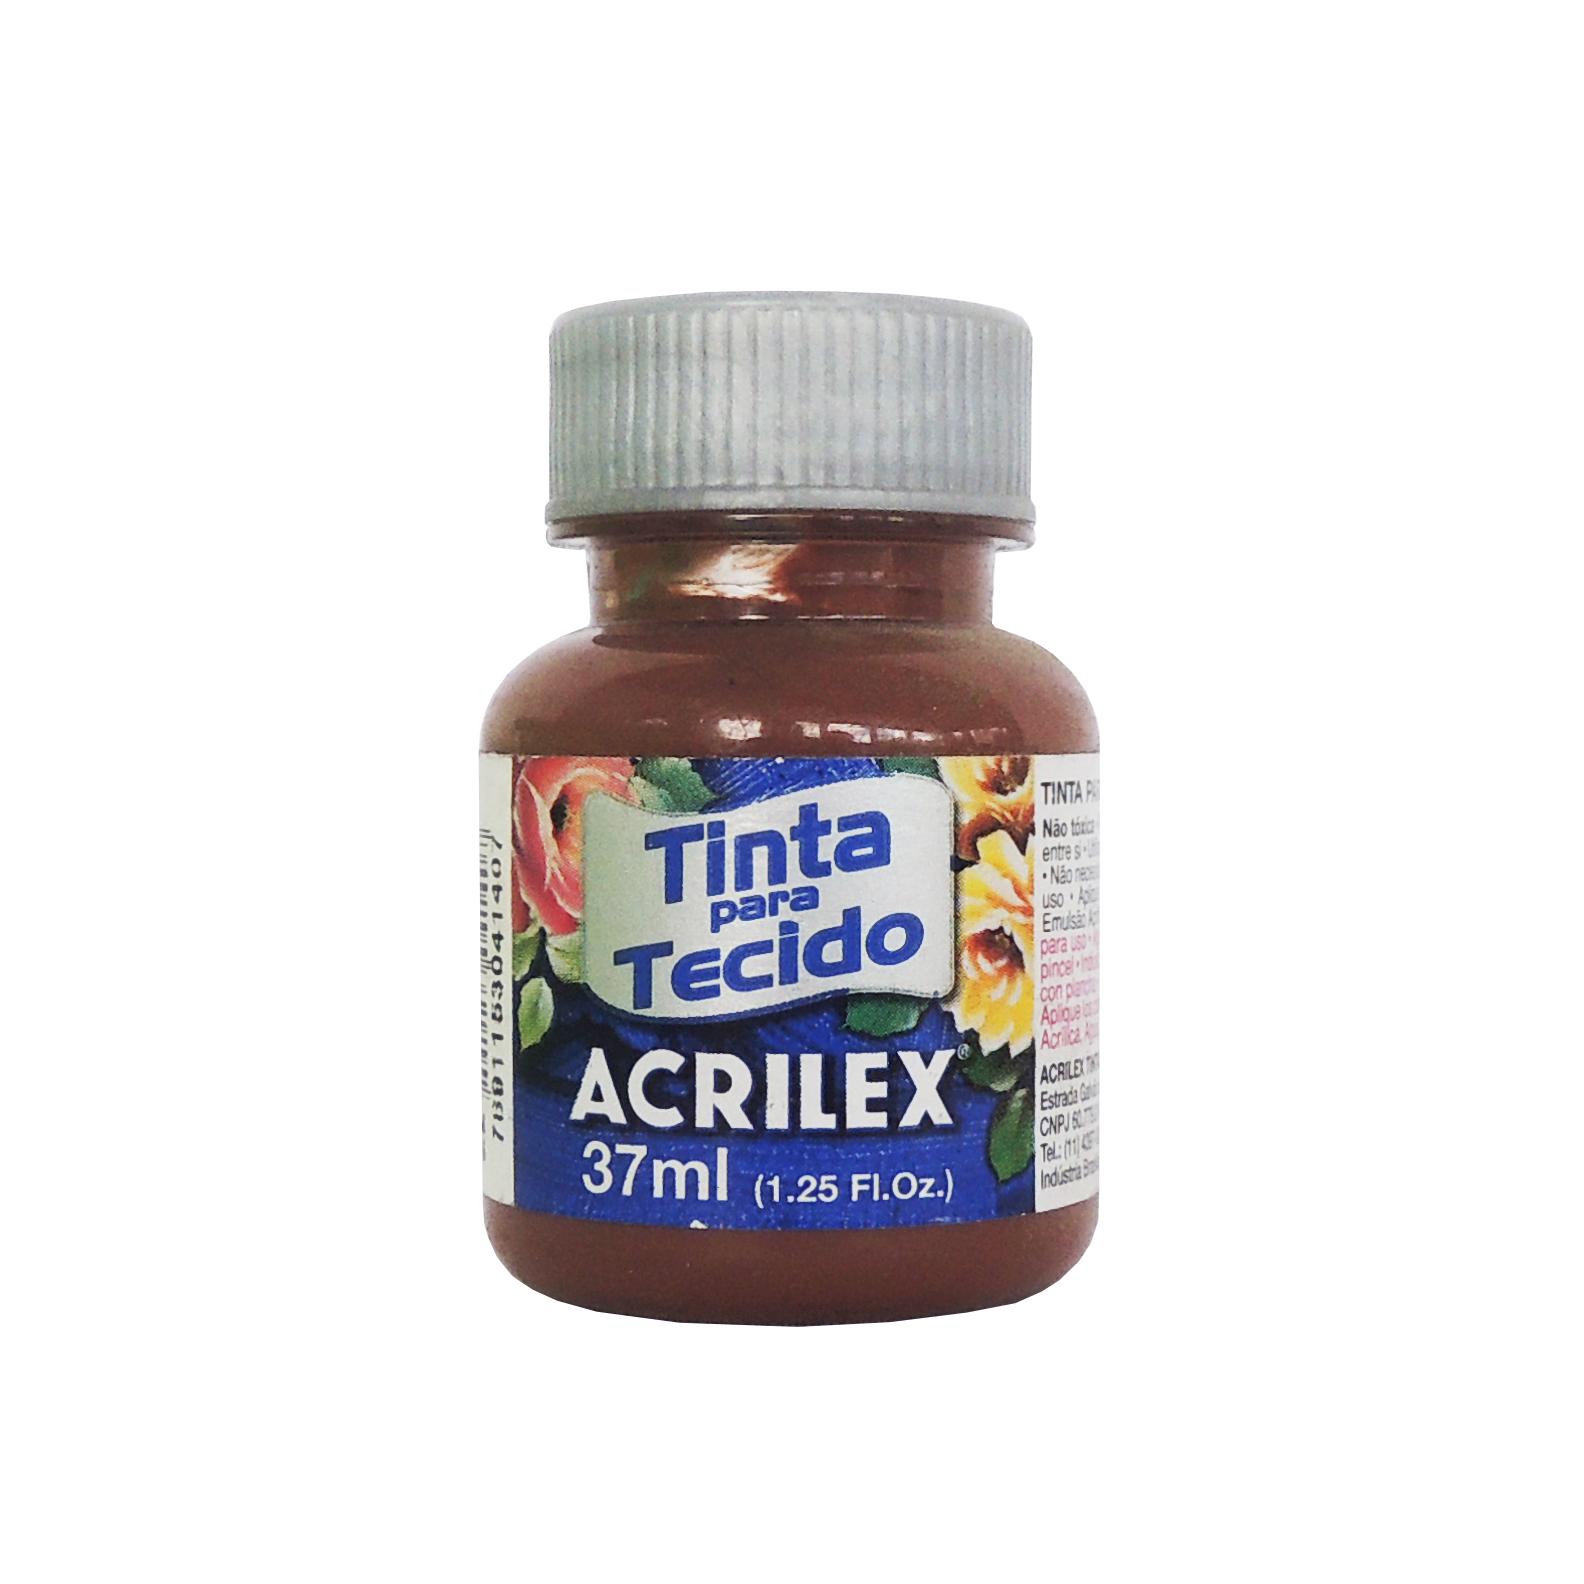 Tinta-para-Tecido-Acrilex-37-ml-531-Marrom